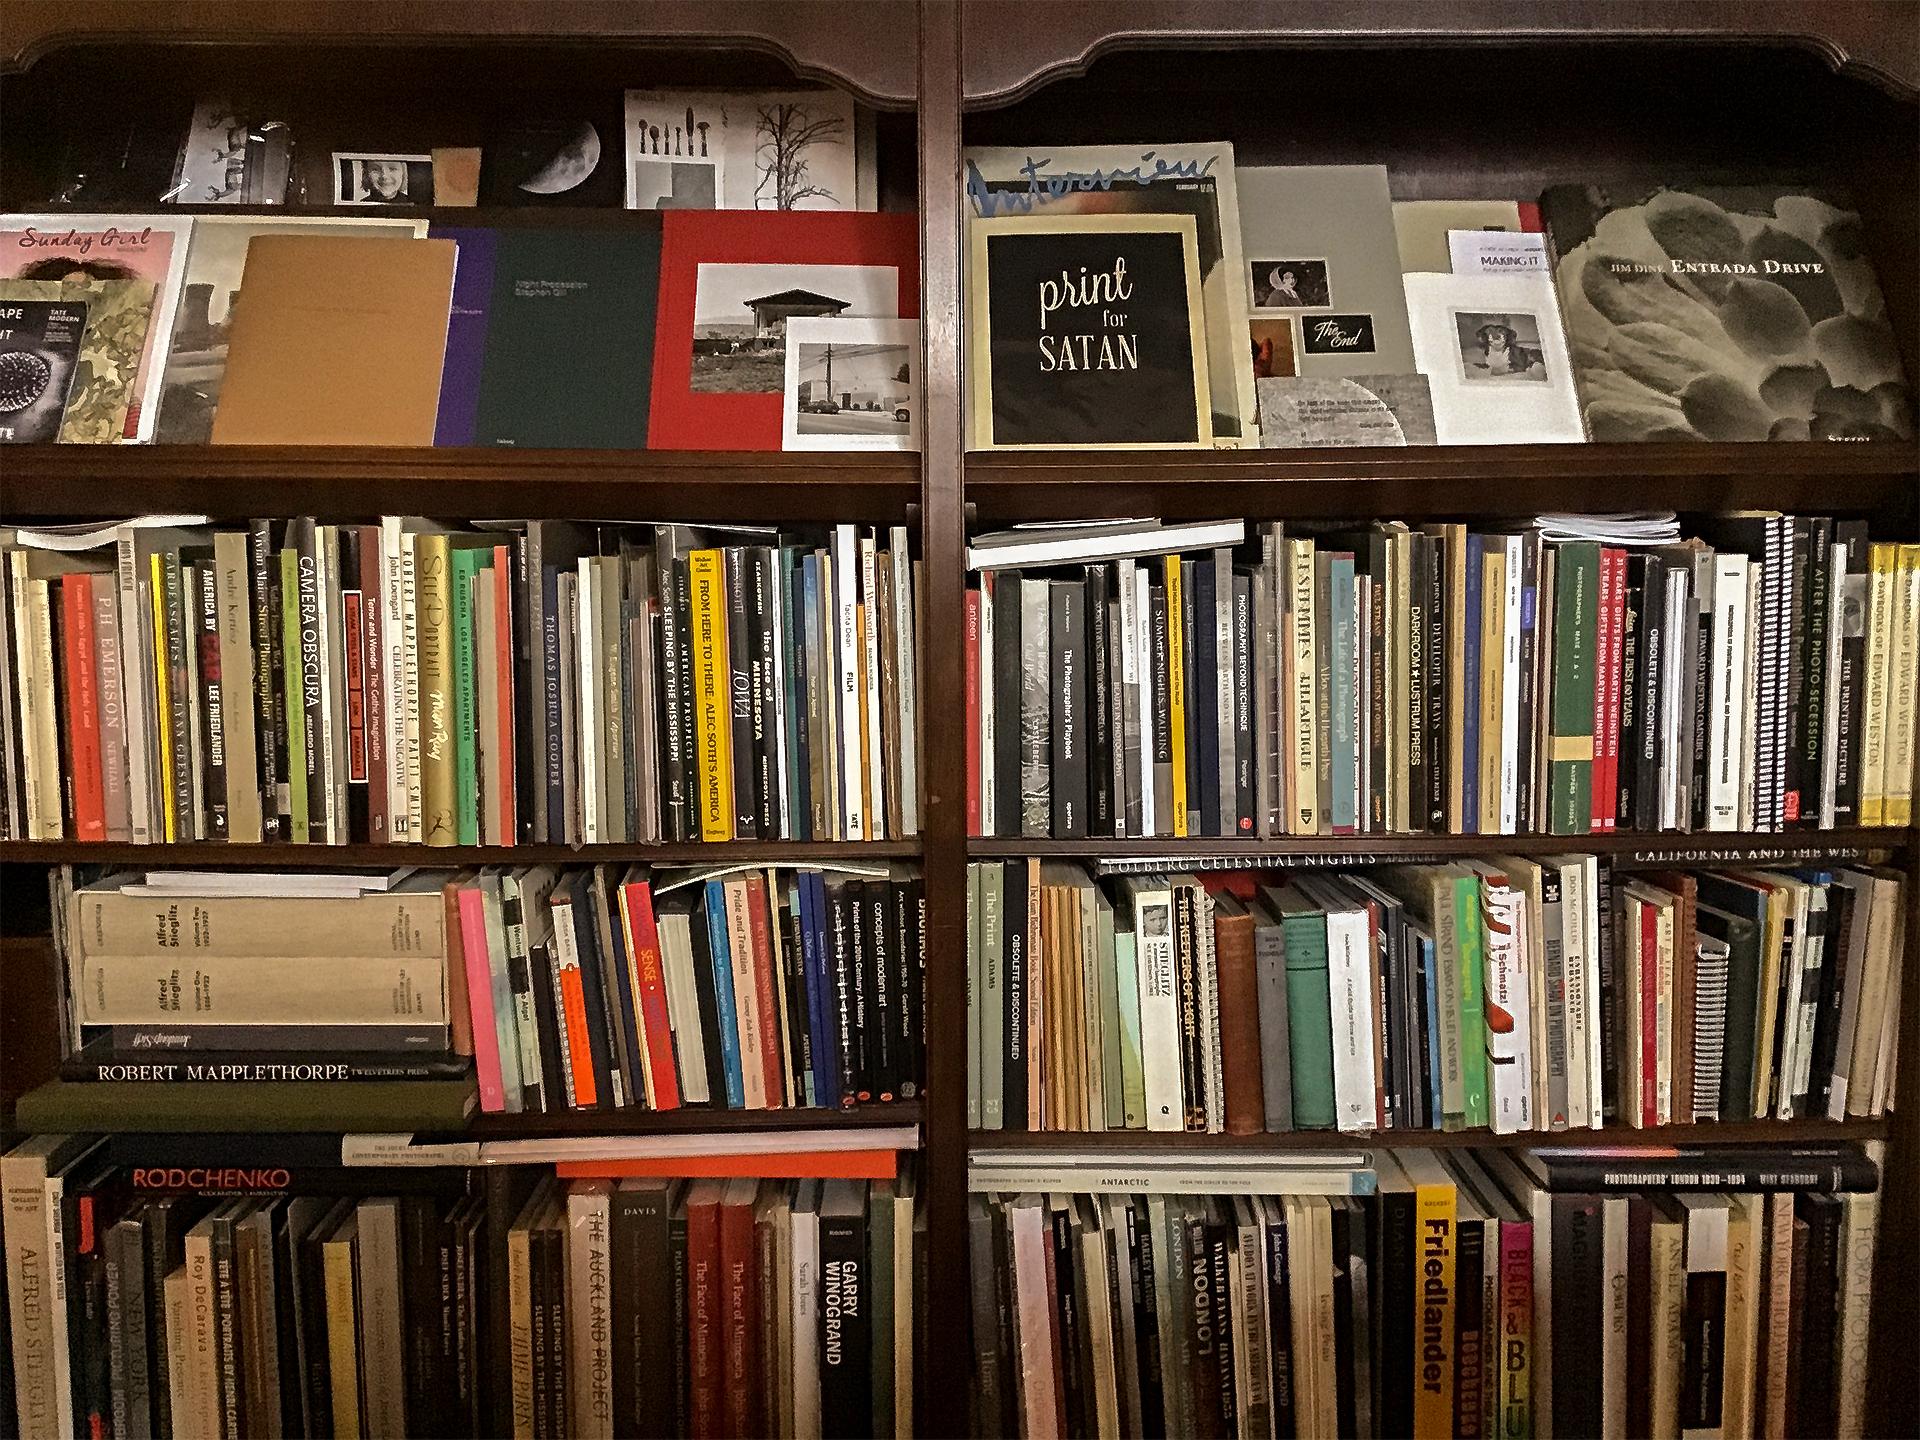 Beautiful display bookshelves house  Keith Taylor 's photobook library.